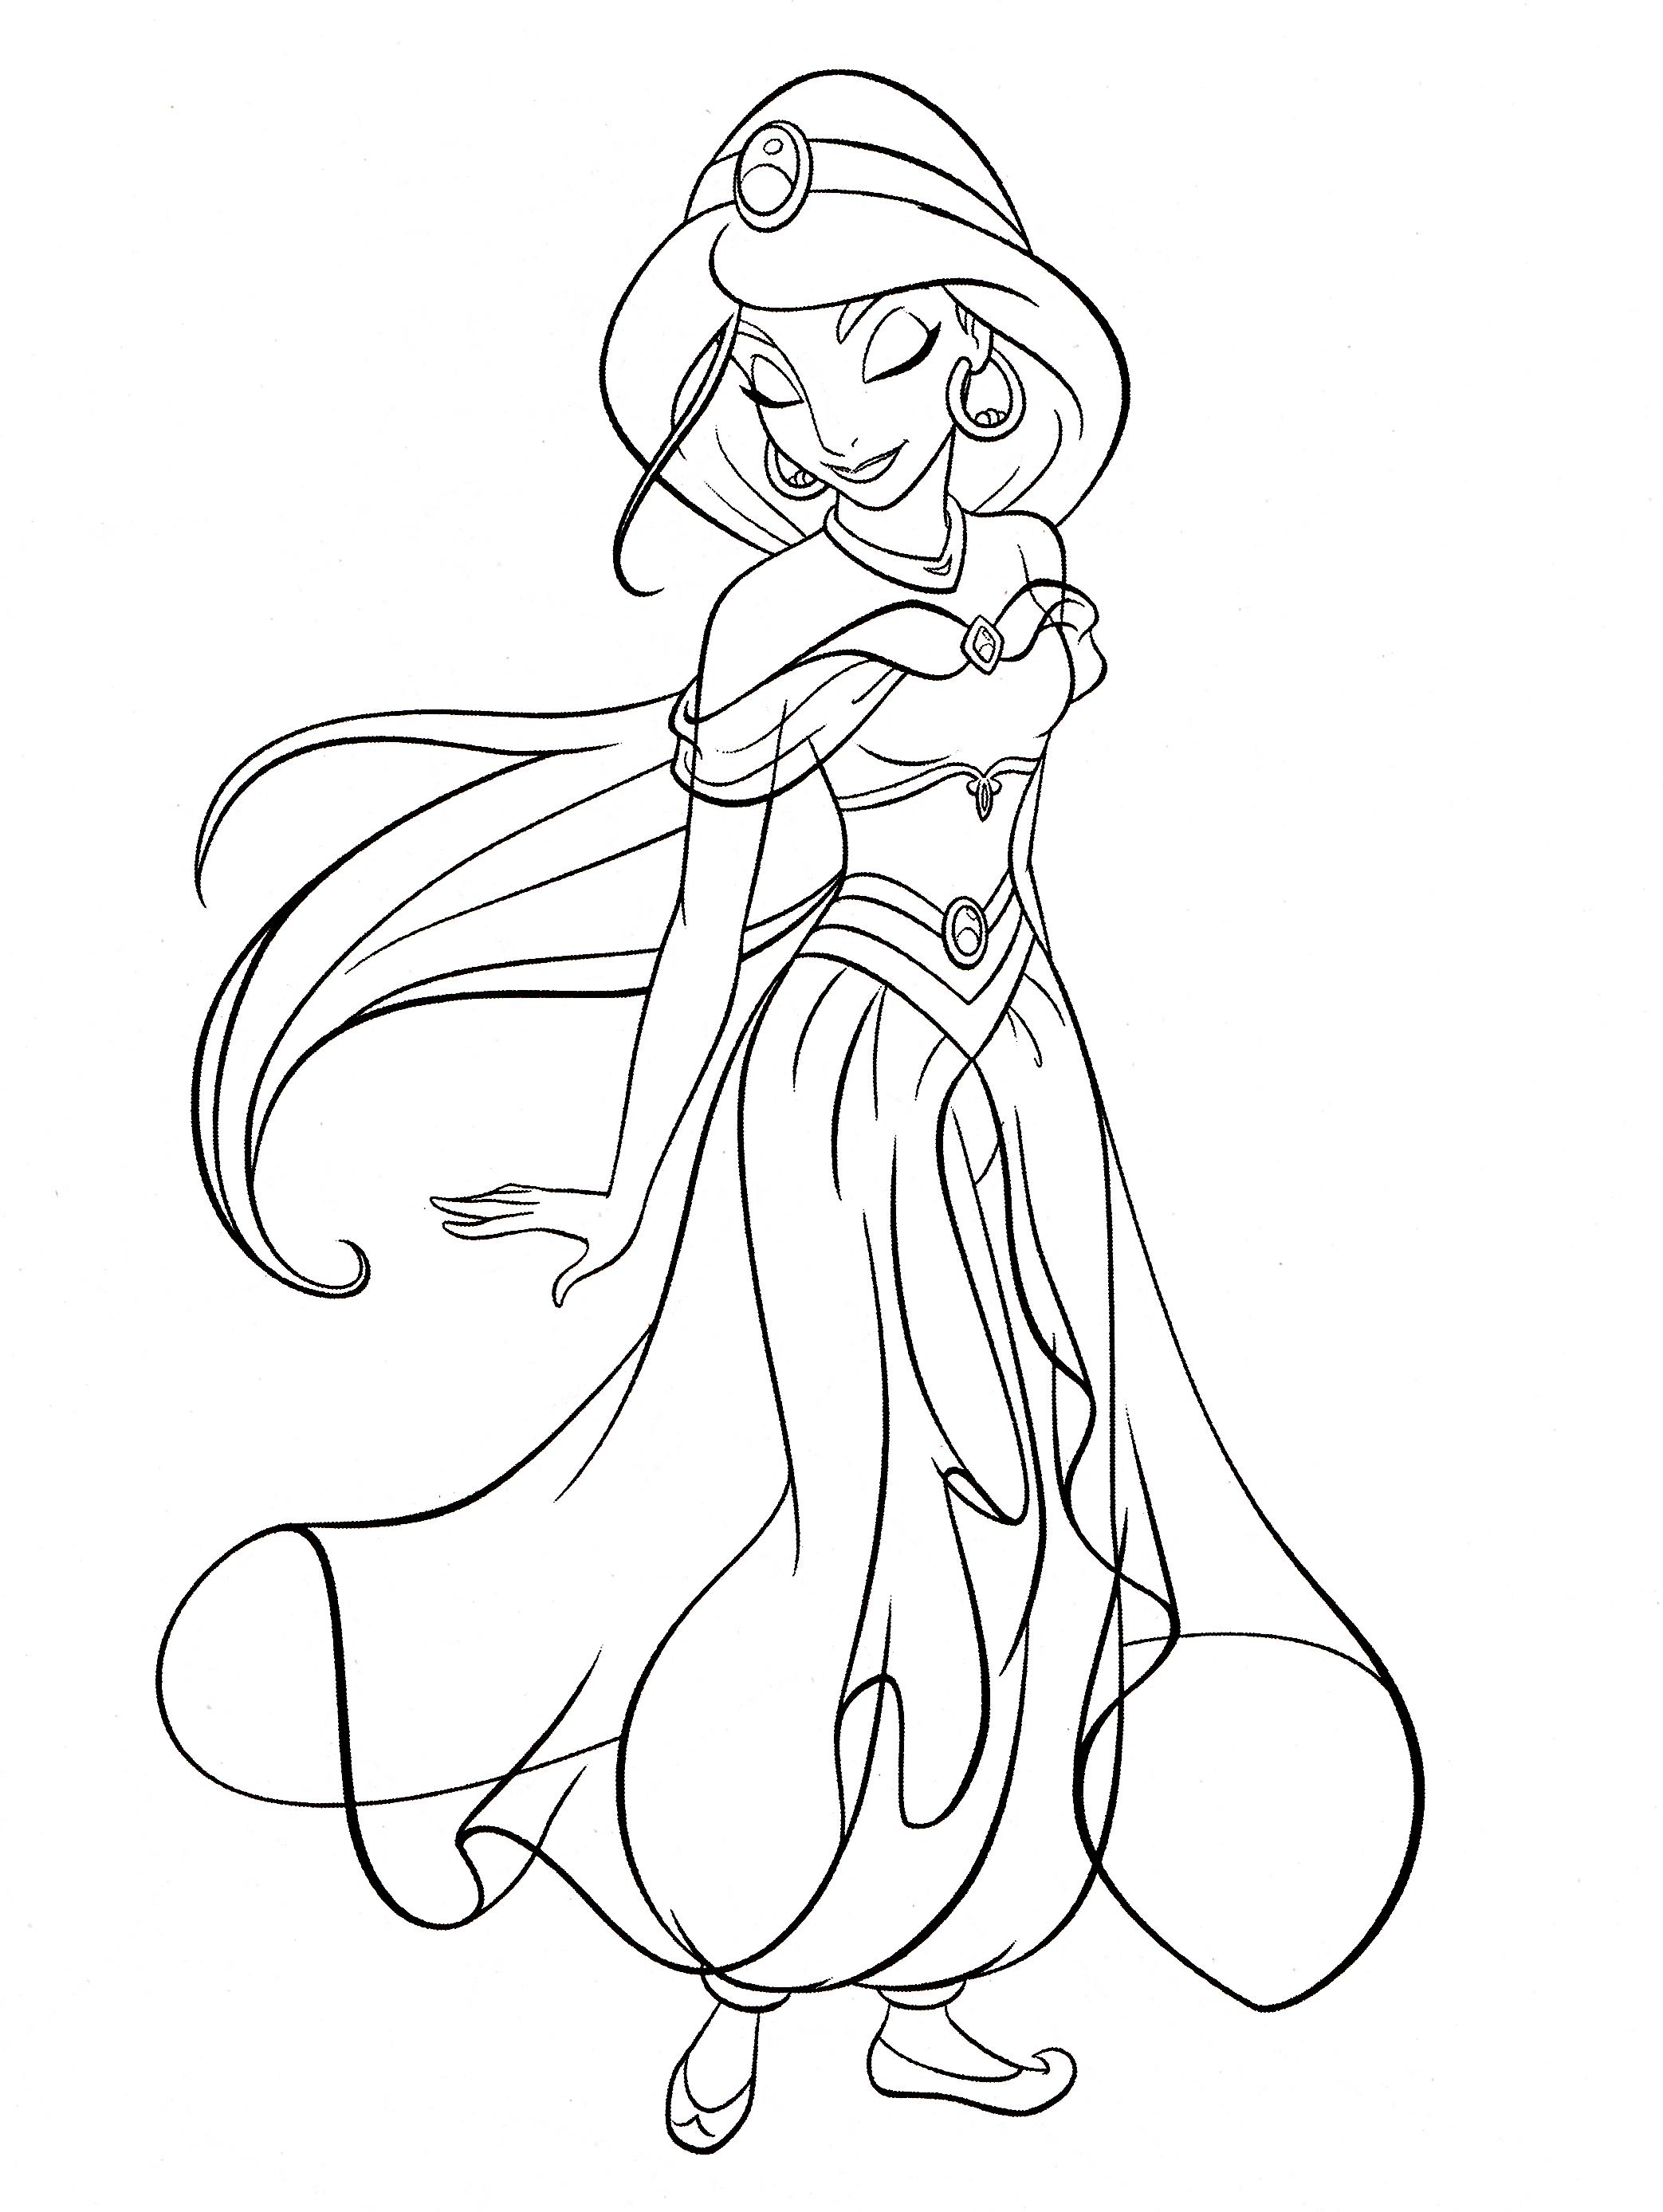 Walt Disney Coloring Pages - Princess Jasmine   Disney ...   free coloring pages disney princess jasmine